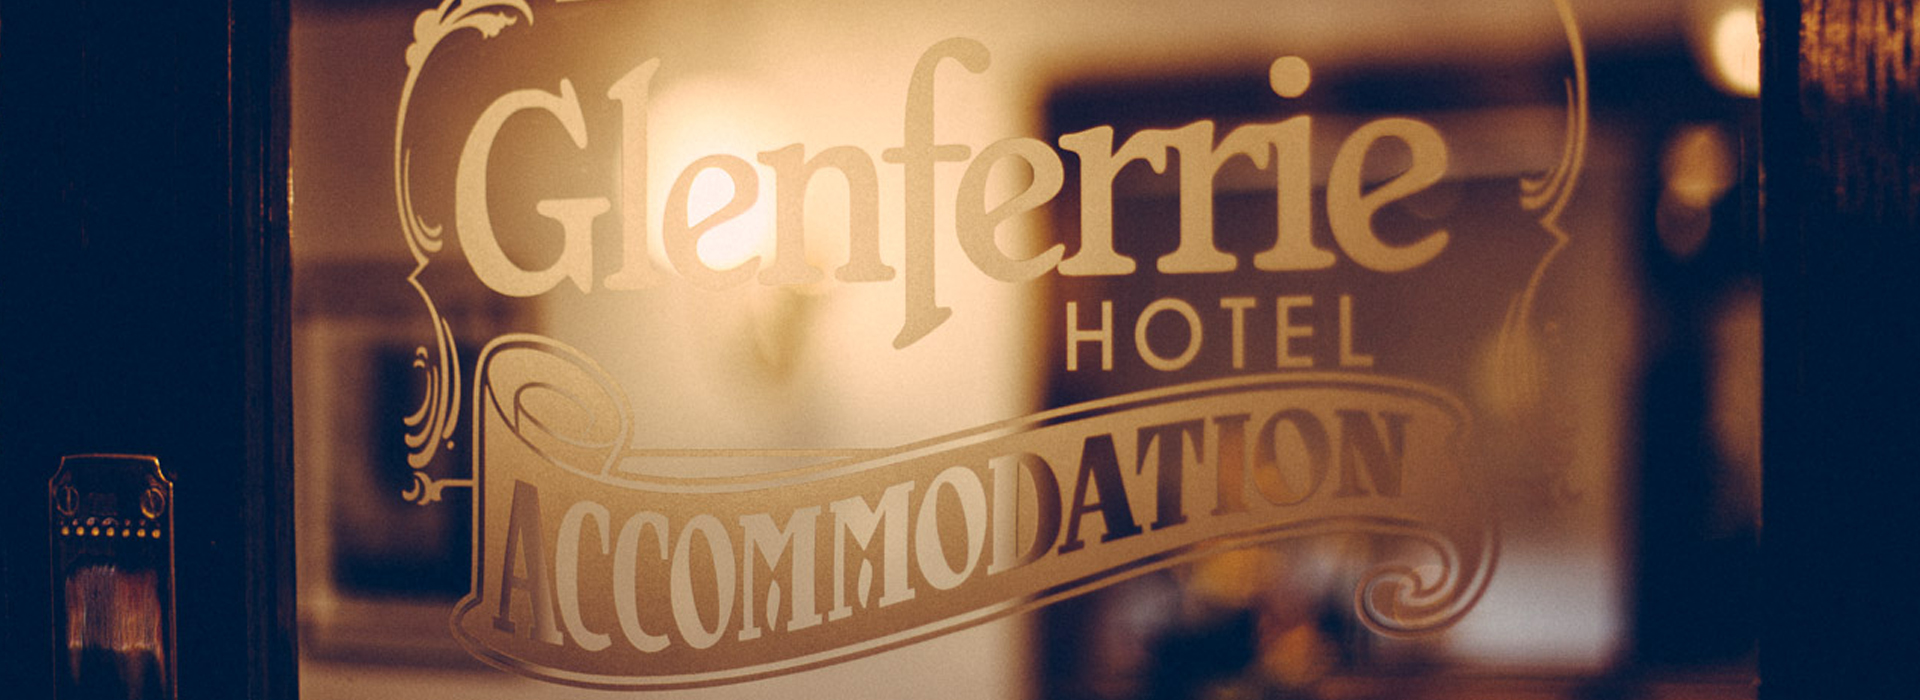 glenferrie hotel melbourne